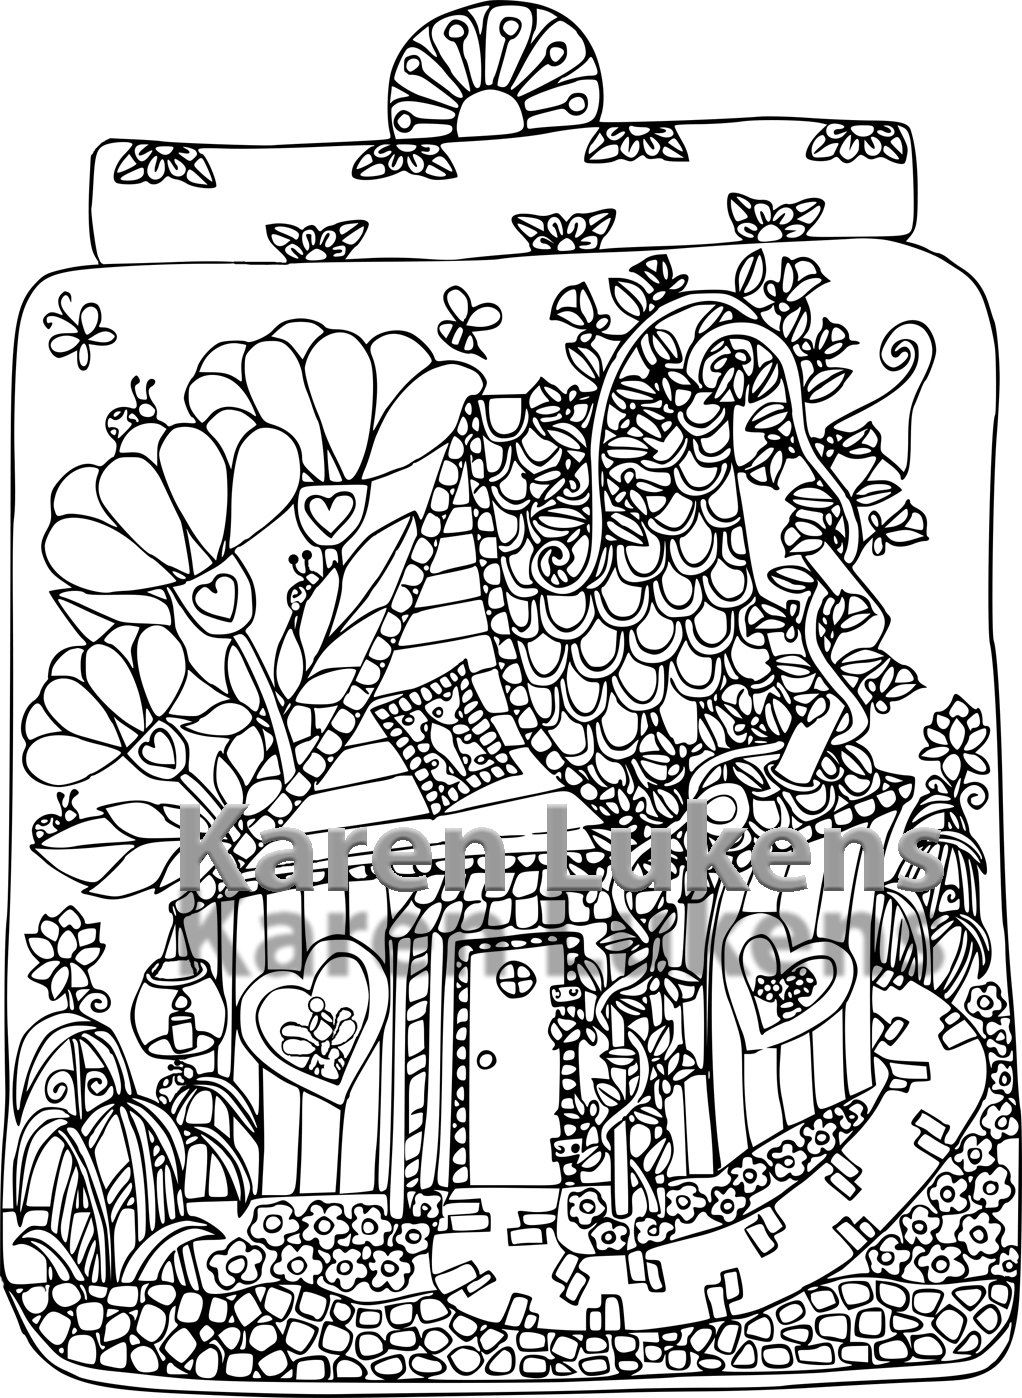 Bildergebnis Fur Printable Fairy House Coloring Pages Adult